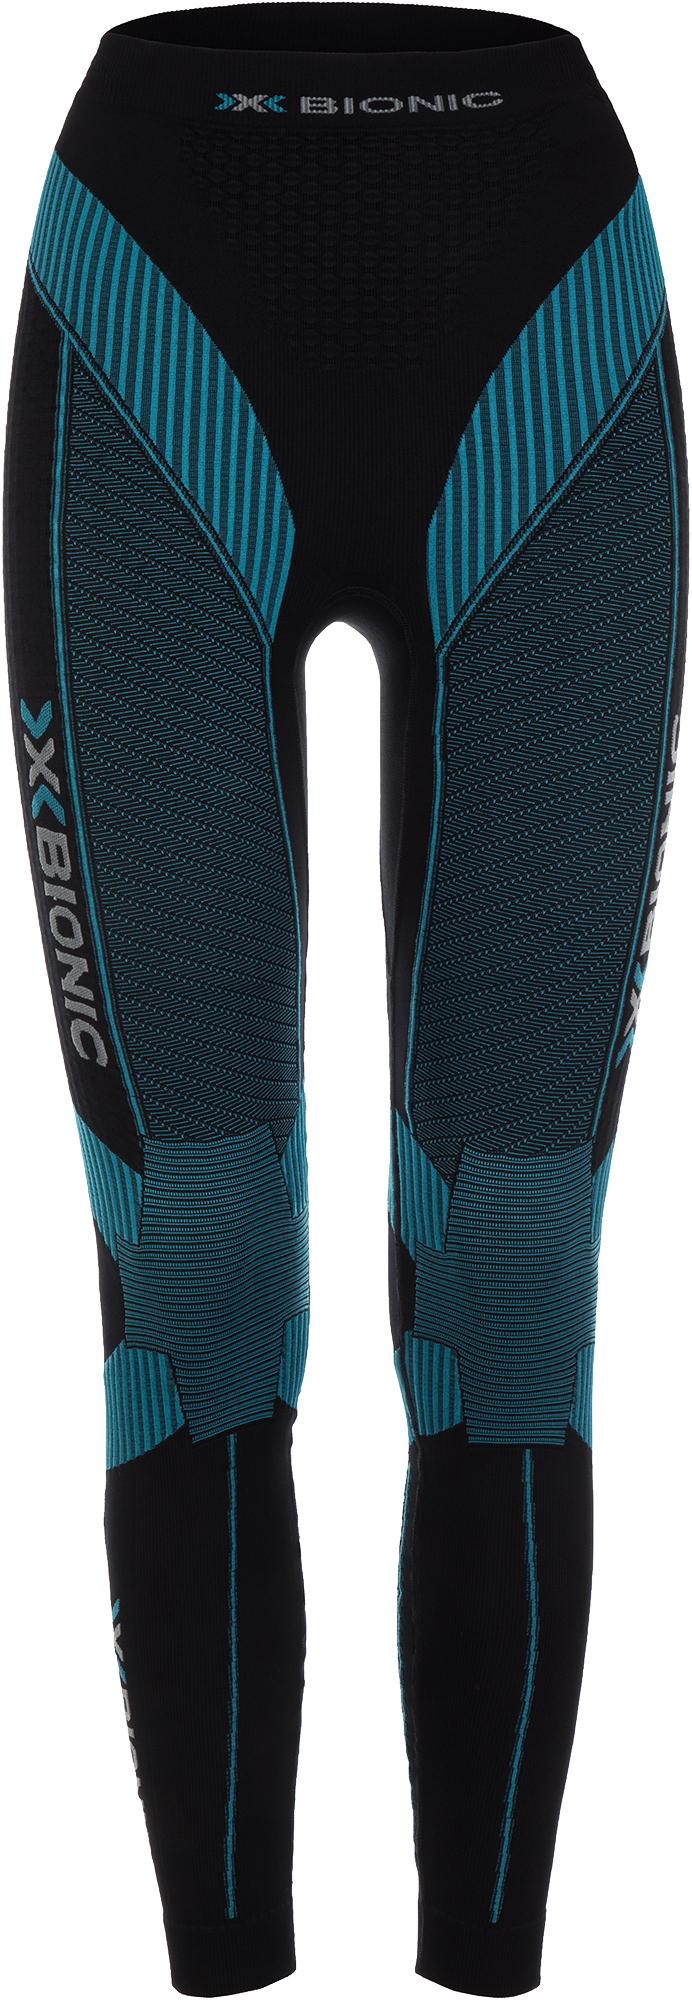 X-Bionic Легинсы женские Effector Power Ow, размер 48